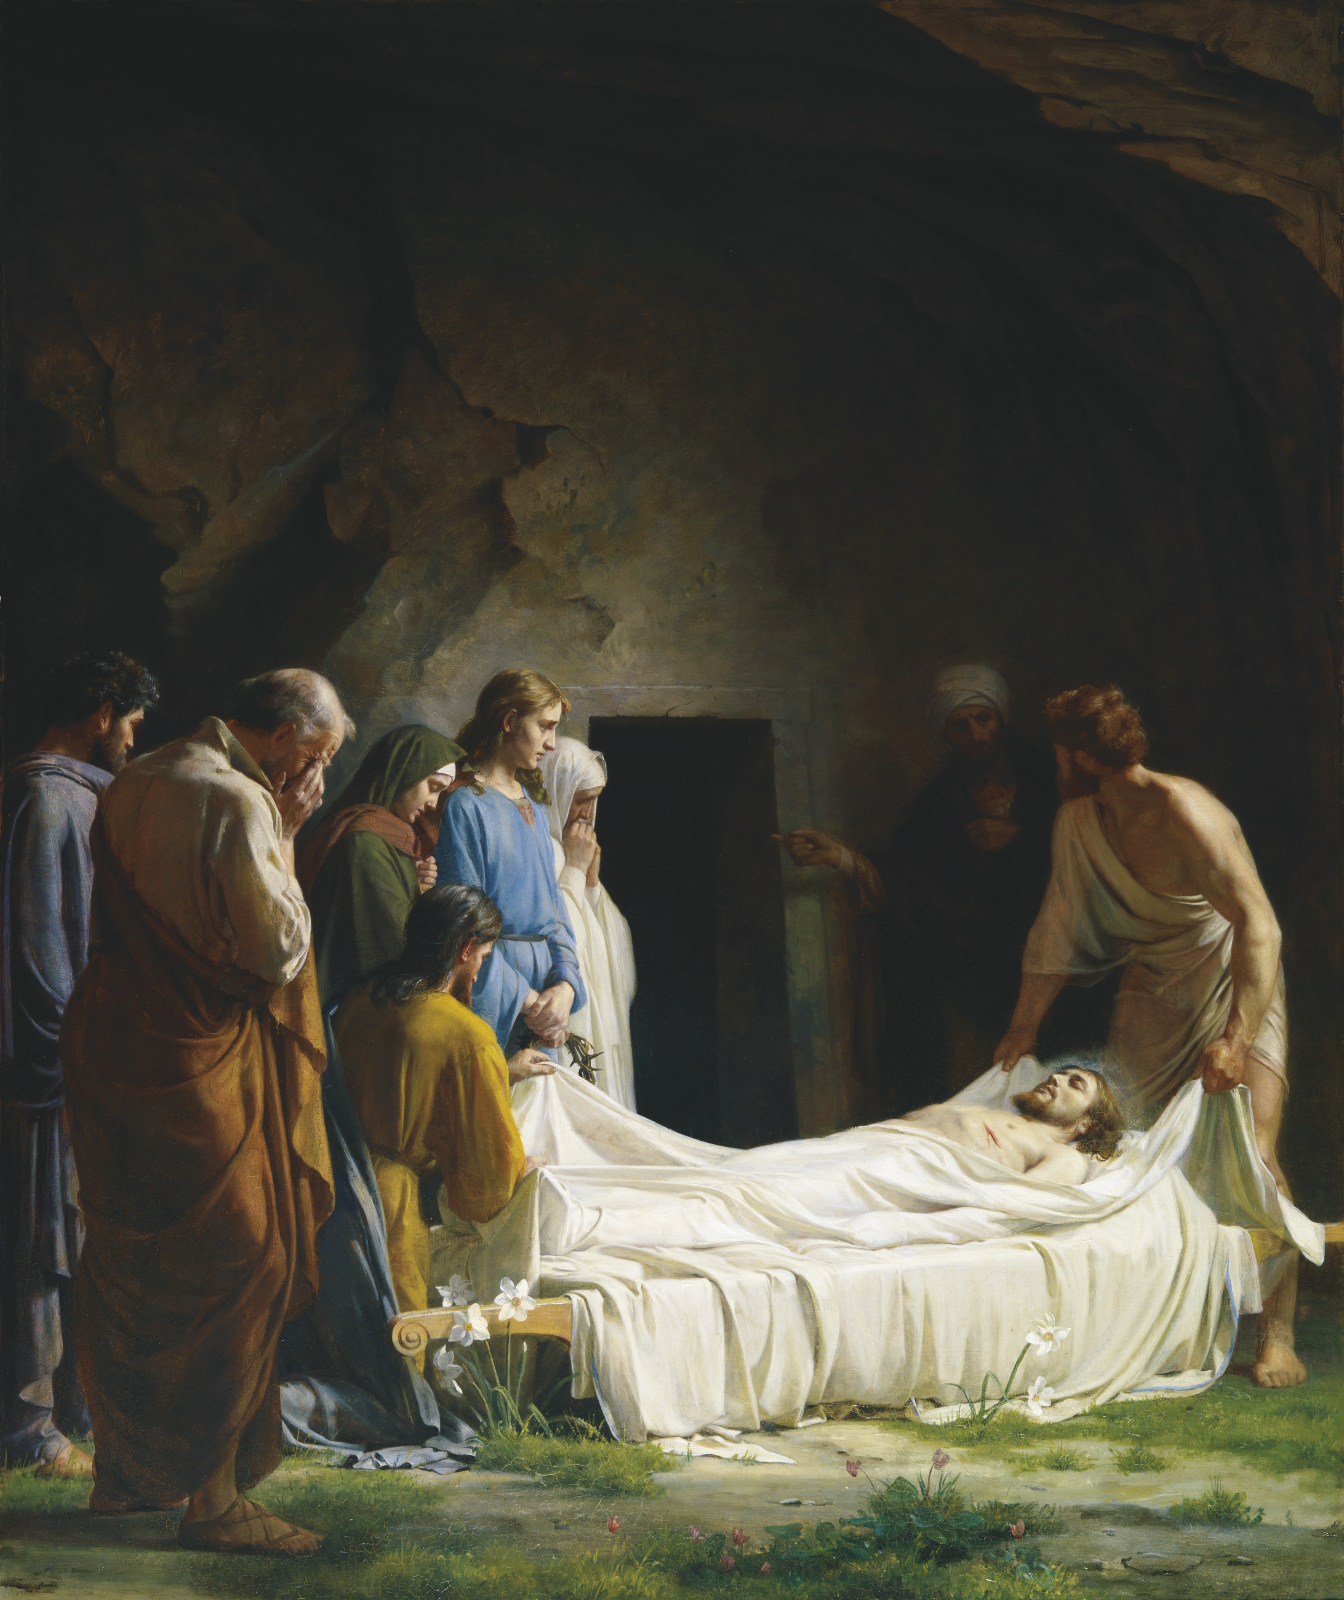 jesus-burial-tomb-1083559-wallpaper.jpg